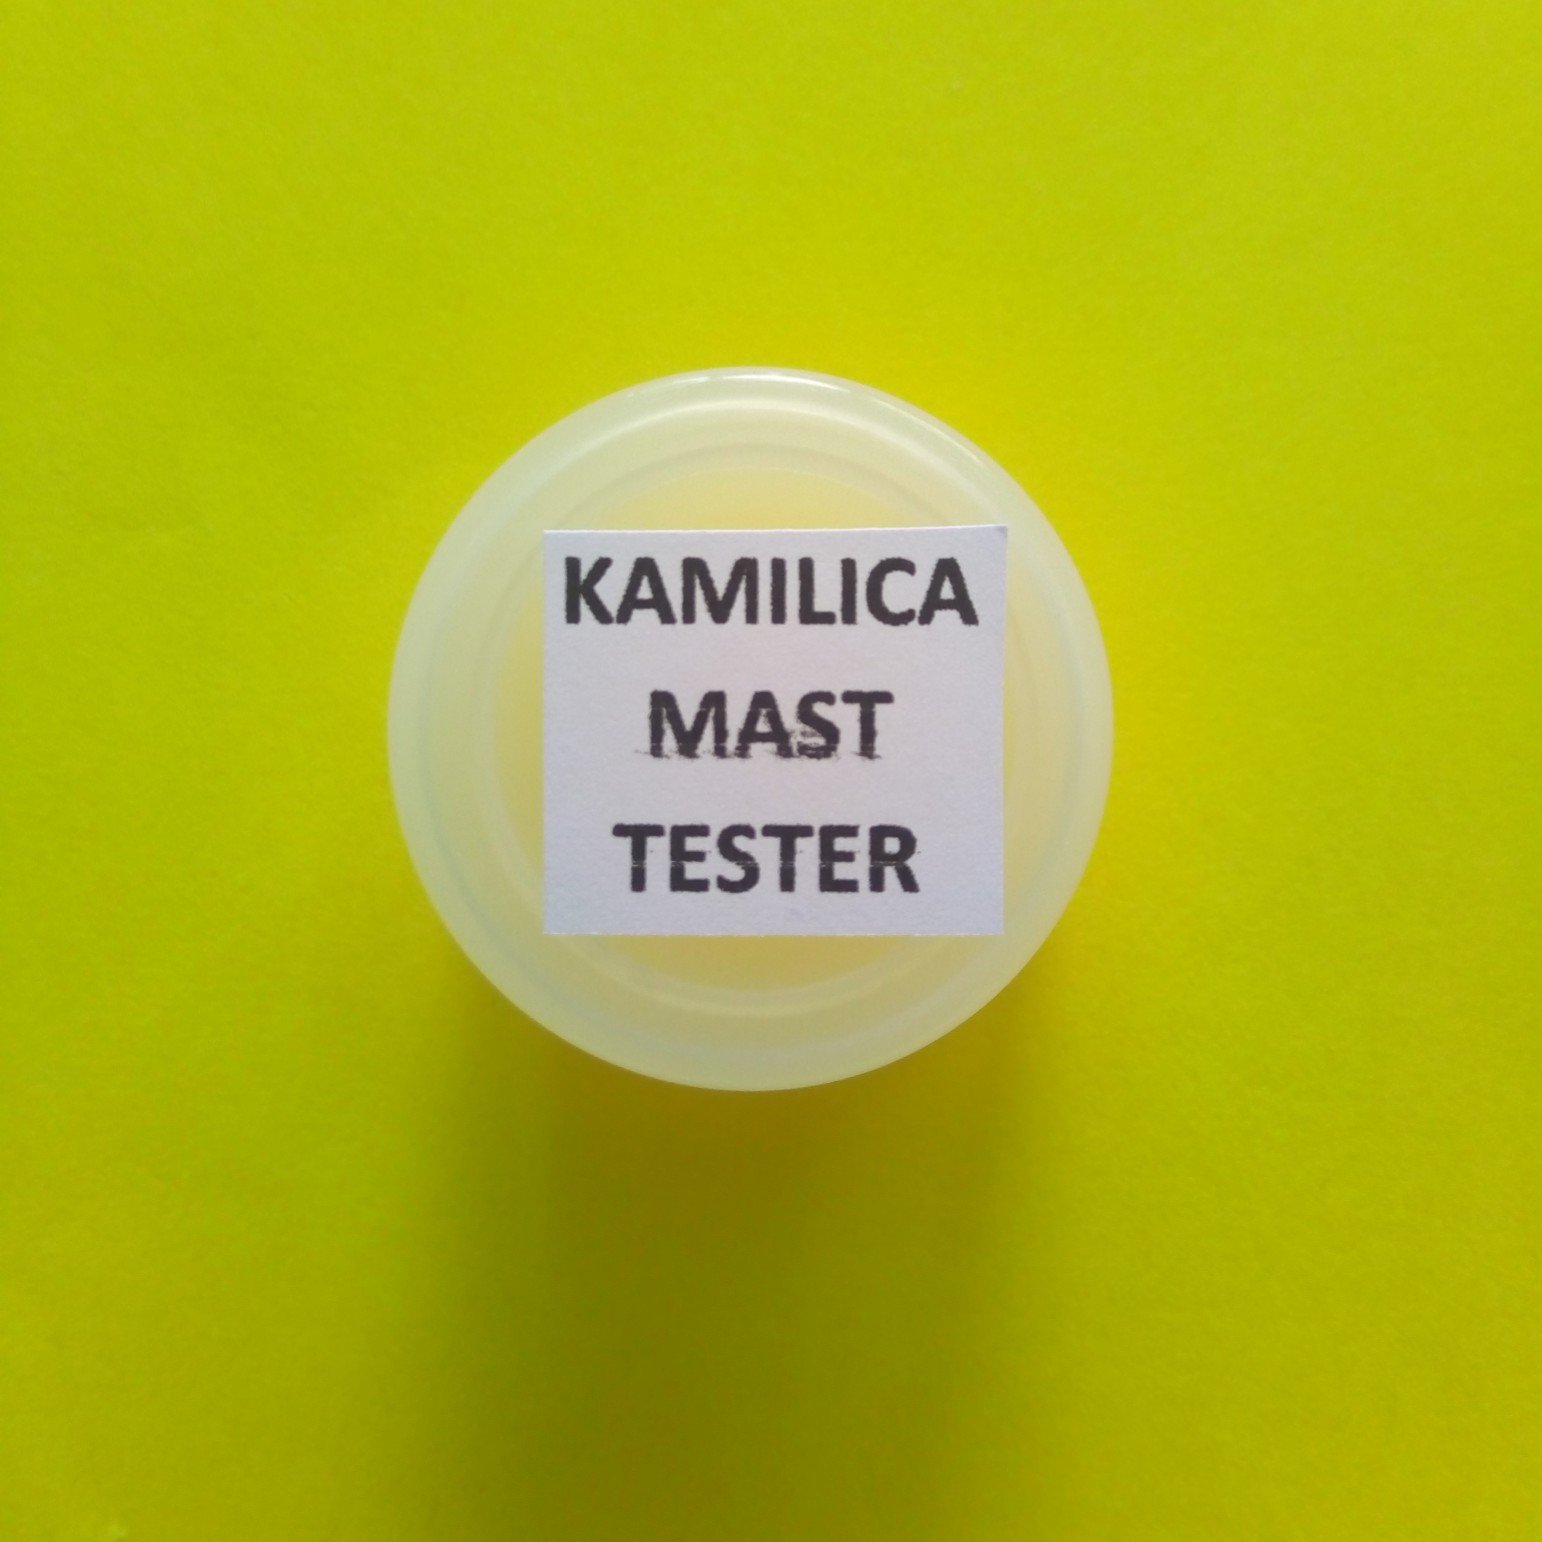 Herbateria - Tester kamilica mast 5 ml 00432